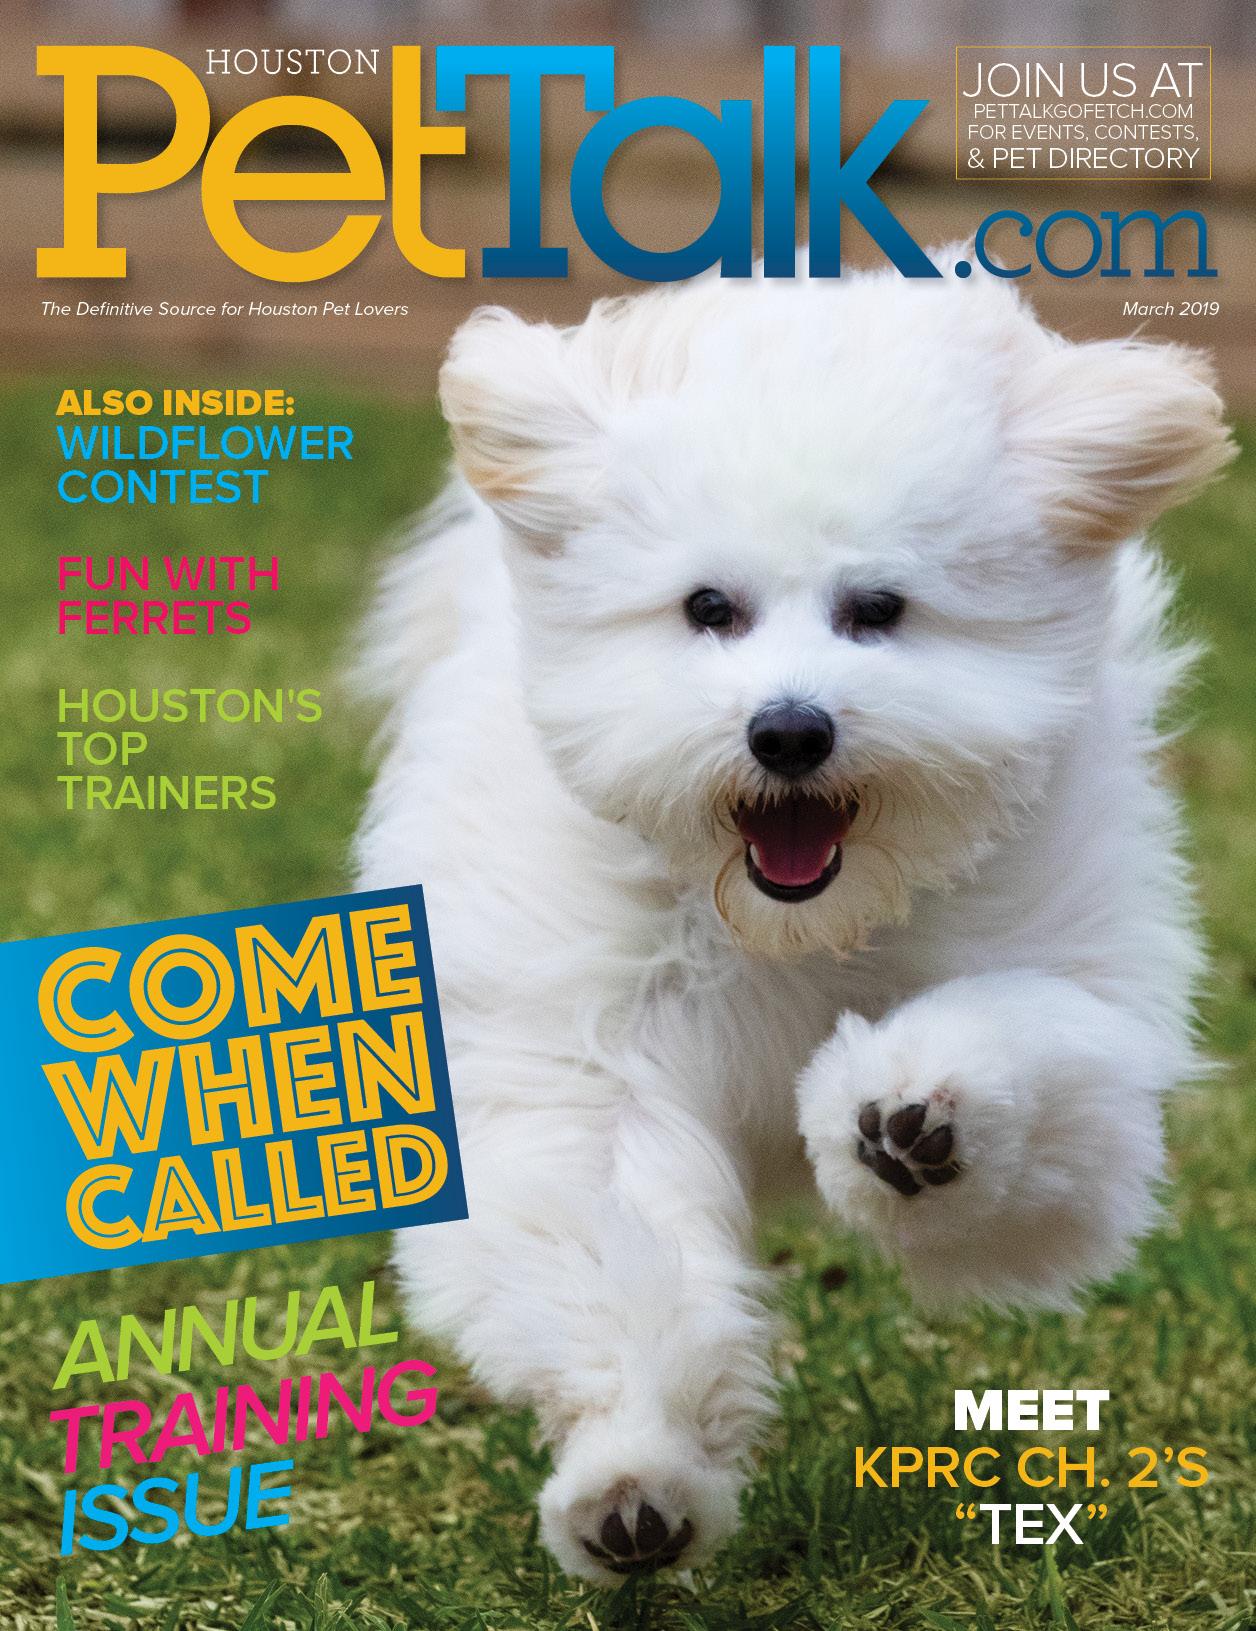 March 2019 Digital Issue of Houston PetTalk